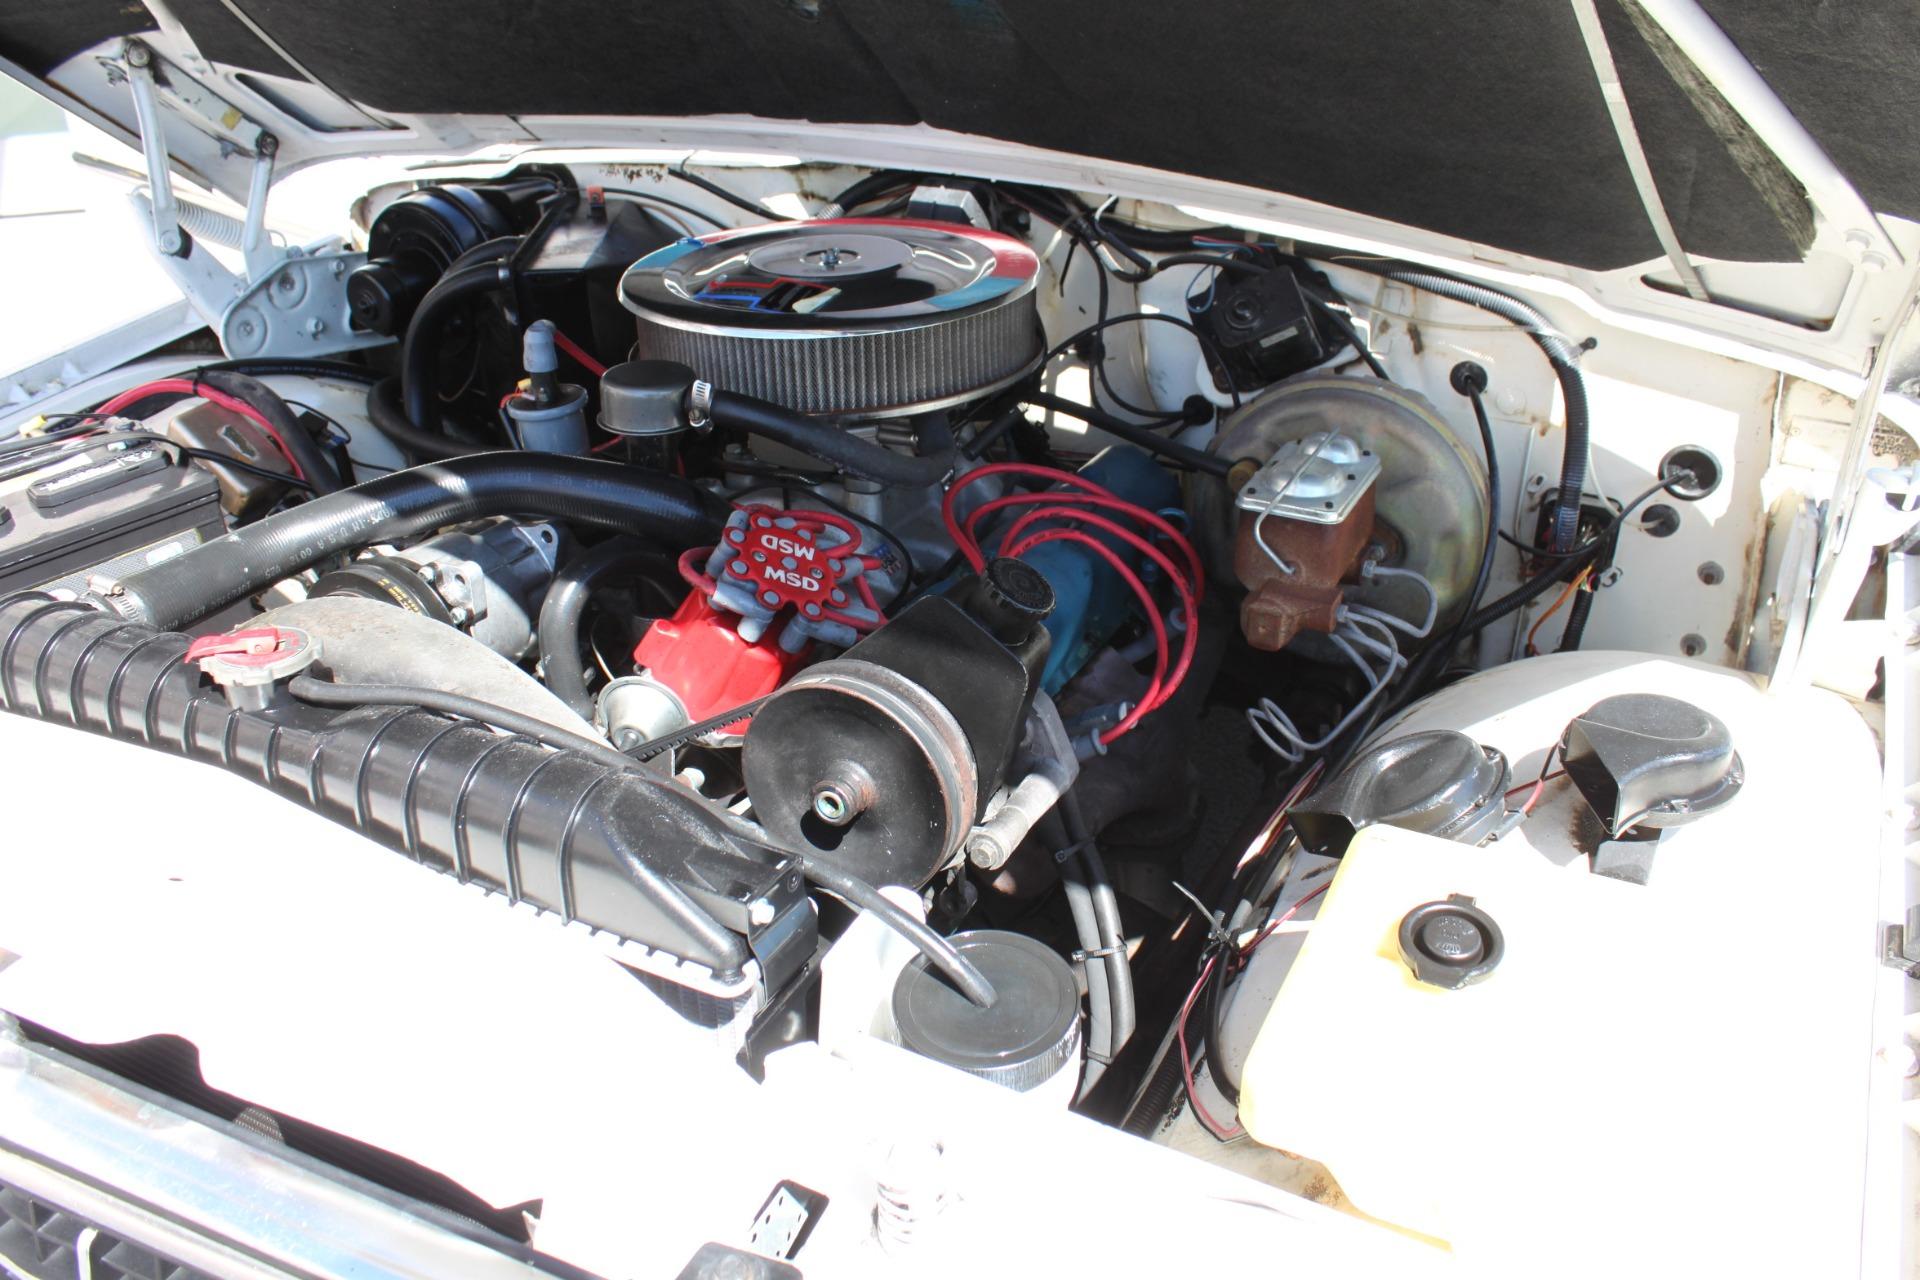 Used-1977-Jeep-Wagoneer-Custom-Fuel-Injected-66-Liter-401-Toyota